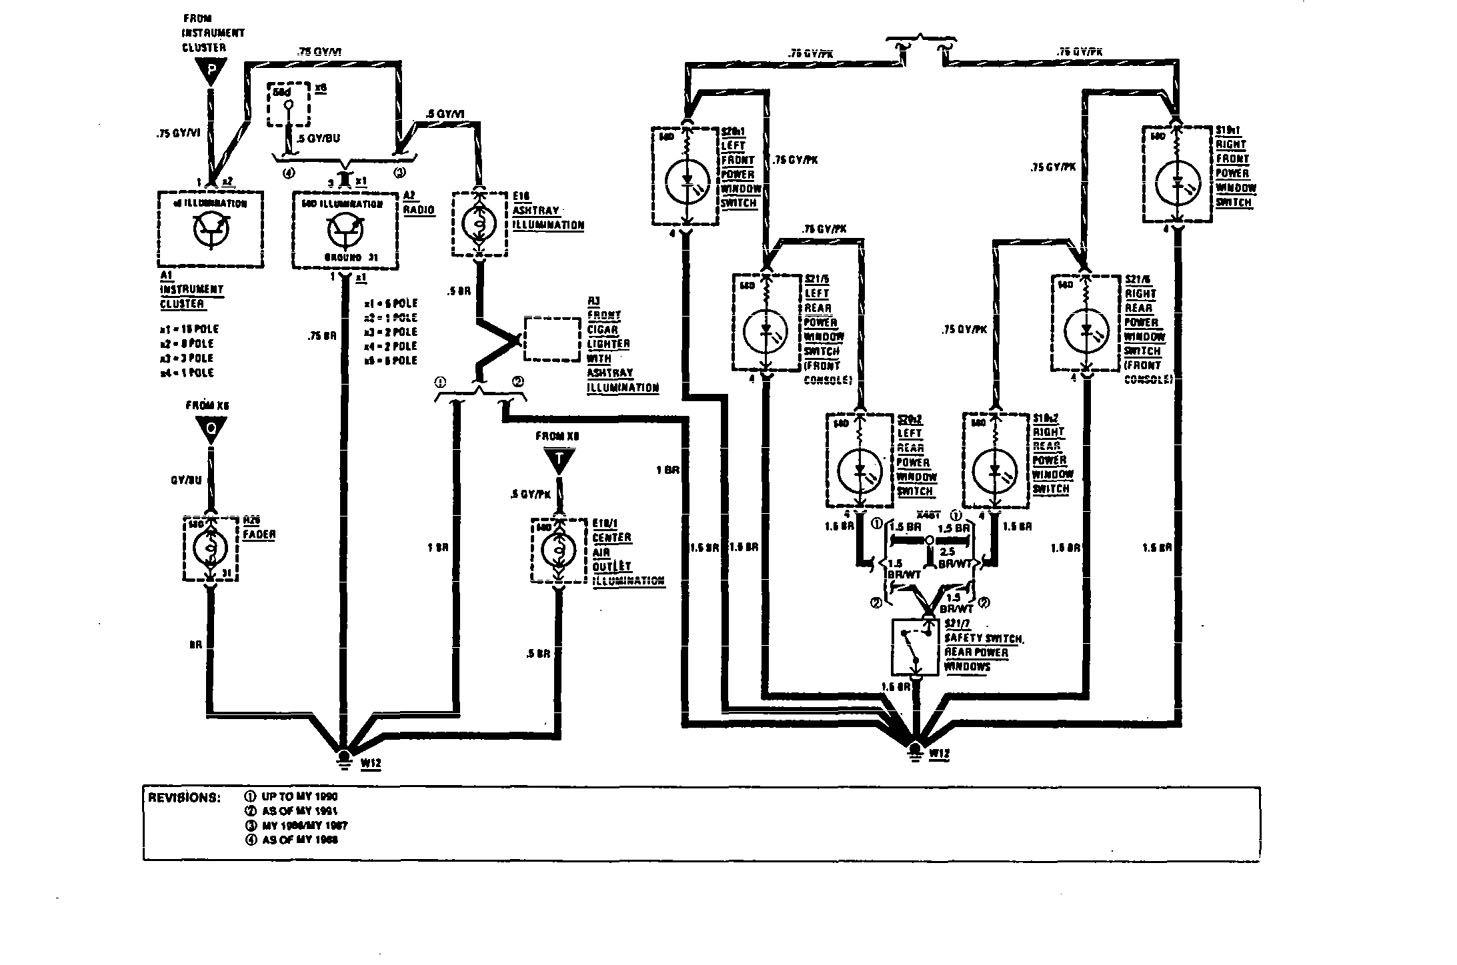 MERCEDES 560SEL FUSE BOX DIAGRAM - Auto Electrical Wiring Diagram on honda wiring diagram, mercedes-benz diagram, dodge wiring diagram, kia wiring diagram, dayton wiring diagram, naza wiring diagram, toyota wiring diagram, freightliner wiring diagram, taylor wiring diagram, mercury wiring diagram, nissan wiring diagram, mercedes speedometer, vw wiring diagram, mercedes timing marks, international wiring diagram, mercedes wire color codes, chevrolet wiring diagram, mercedes electrical diagrams, mercedes wiring color, mercedes firing order,